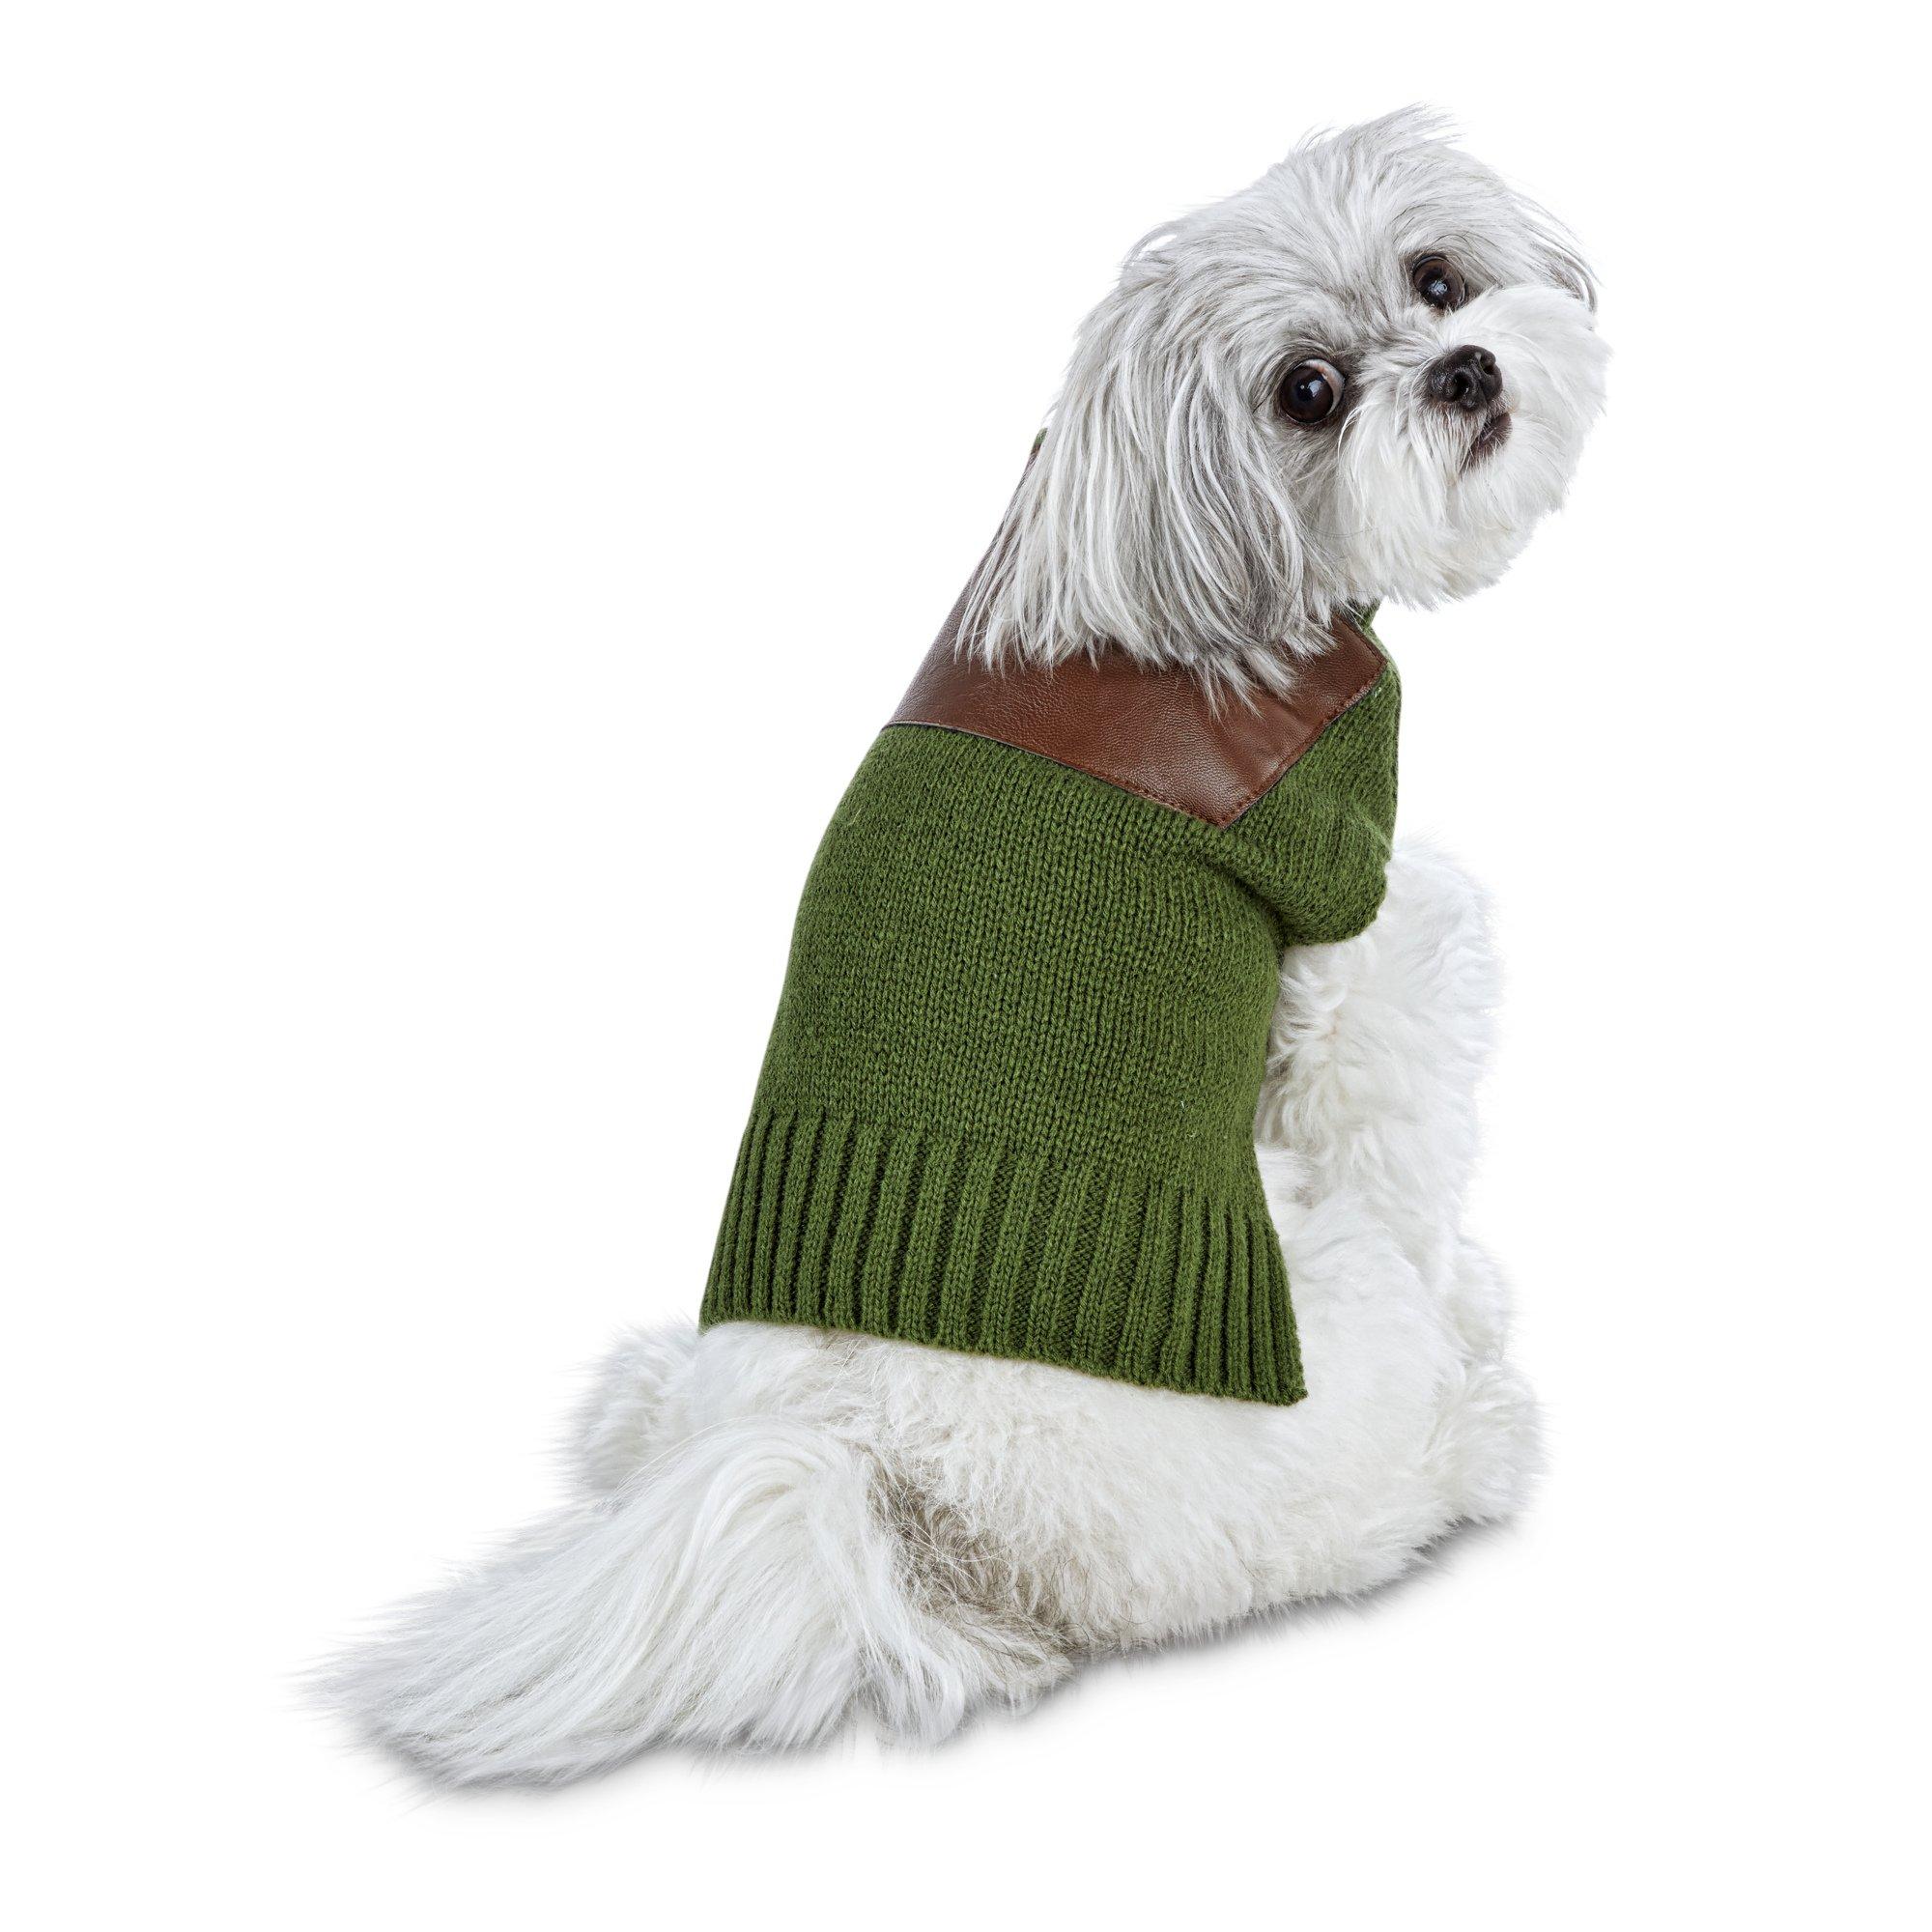 low priced 601b3 96bae Bond & Co. Emerald Green Dog Sweater, Medium | Petco